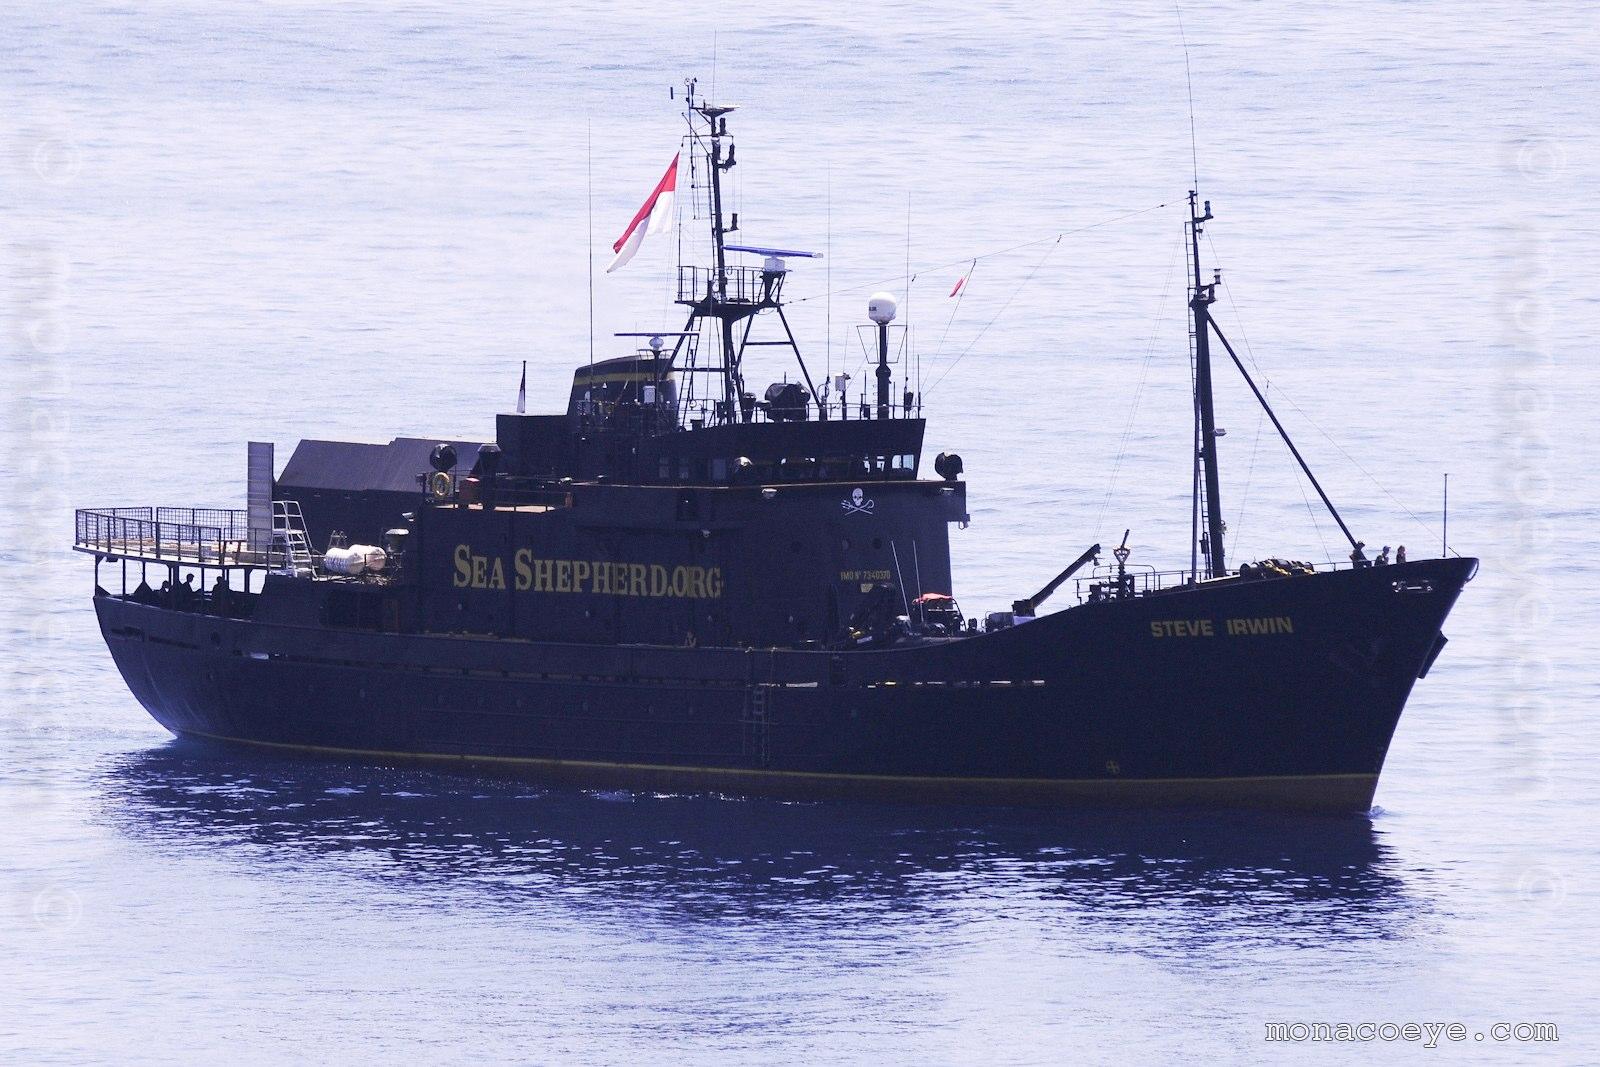 Steve Irwin. 53 metre anti-whaling ship in the Sea Shepherd fleet